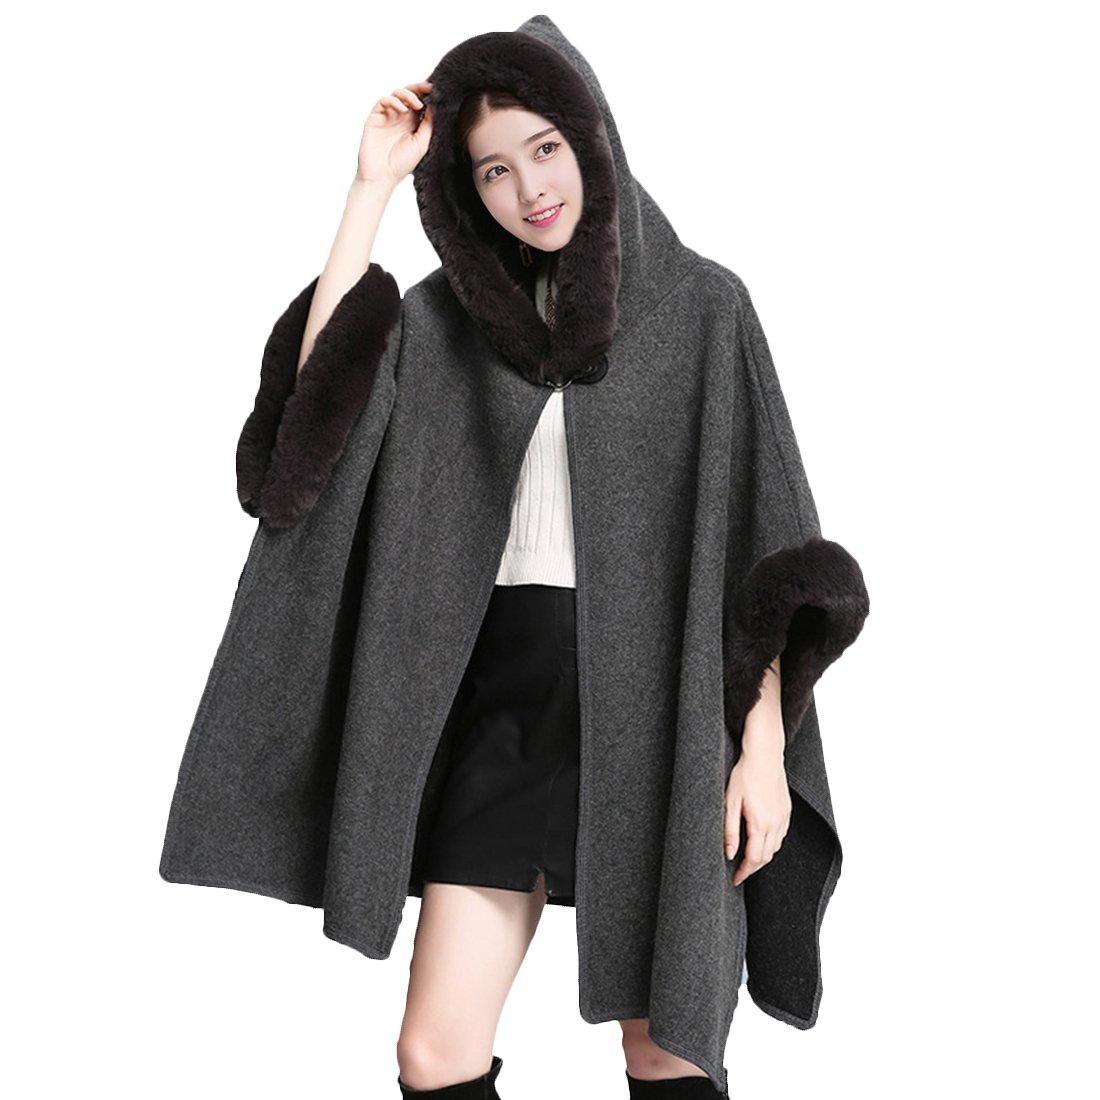 Partiss Women Faux Fur Hooded Winter Fashion Wool Cloak Capes Cardigans Coat 20171019YX4-3